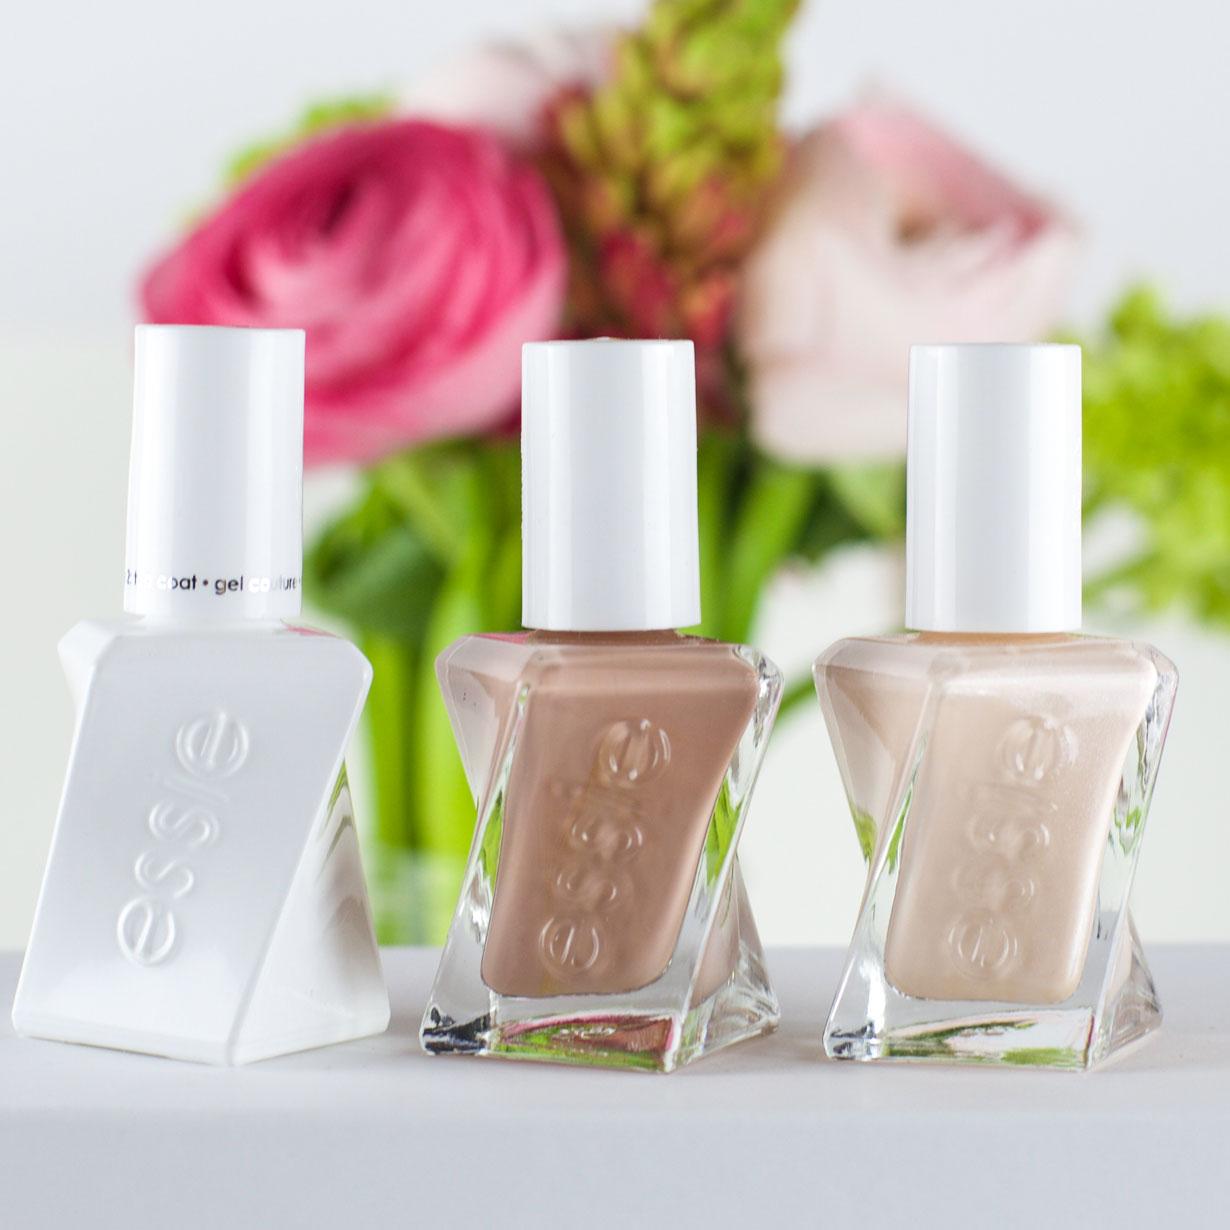 Essie Nail Polish Bottle Size | Hession Hairdressing